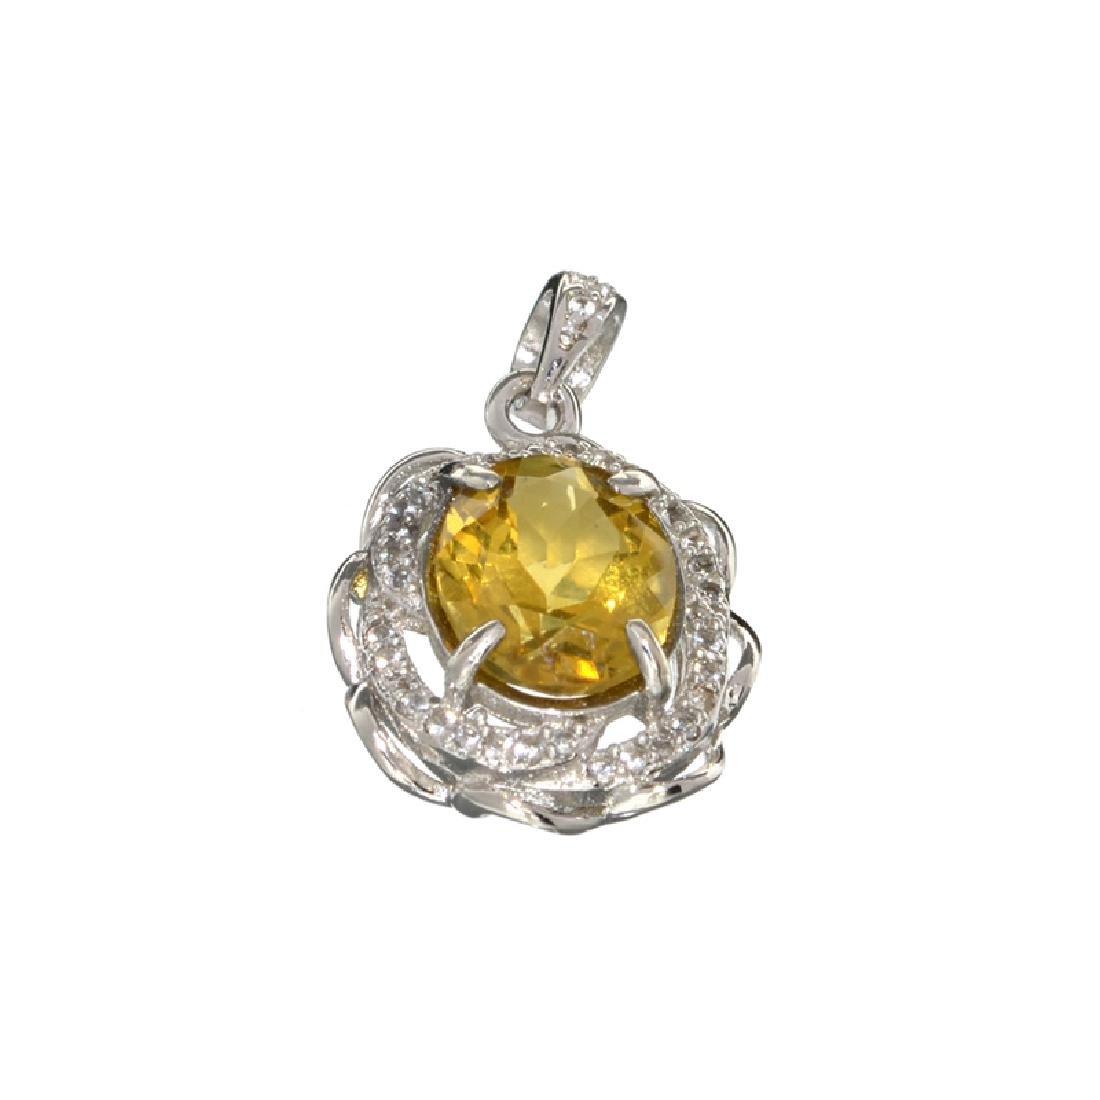 APP: 0.9k Fine Jewelry 3.00CT Oval Cut Citrine/White